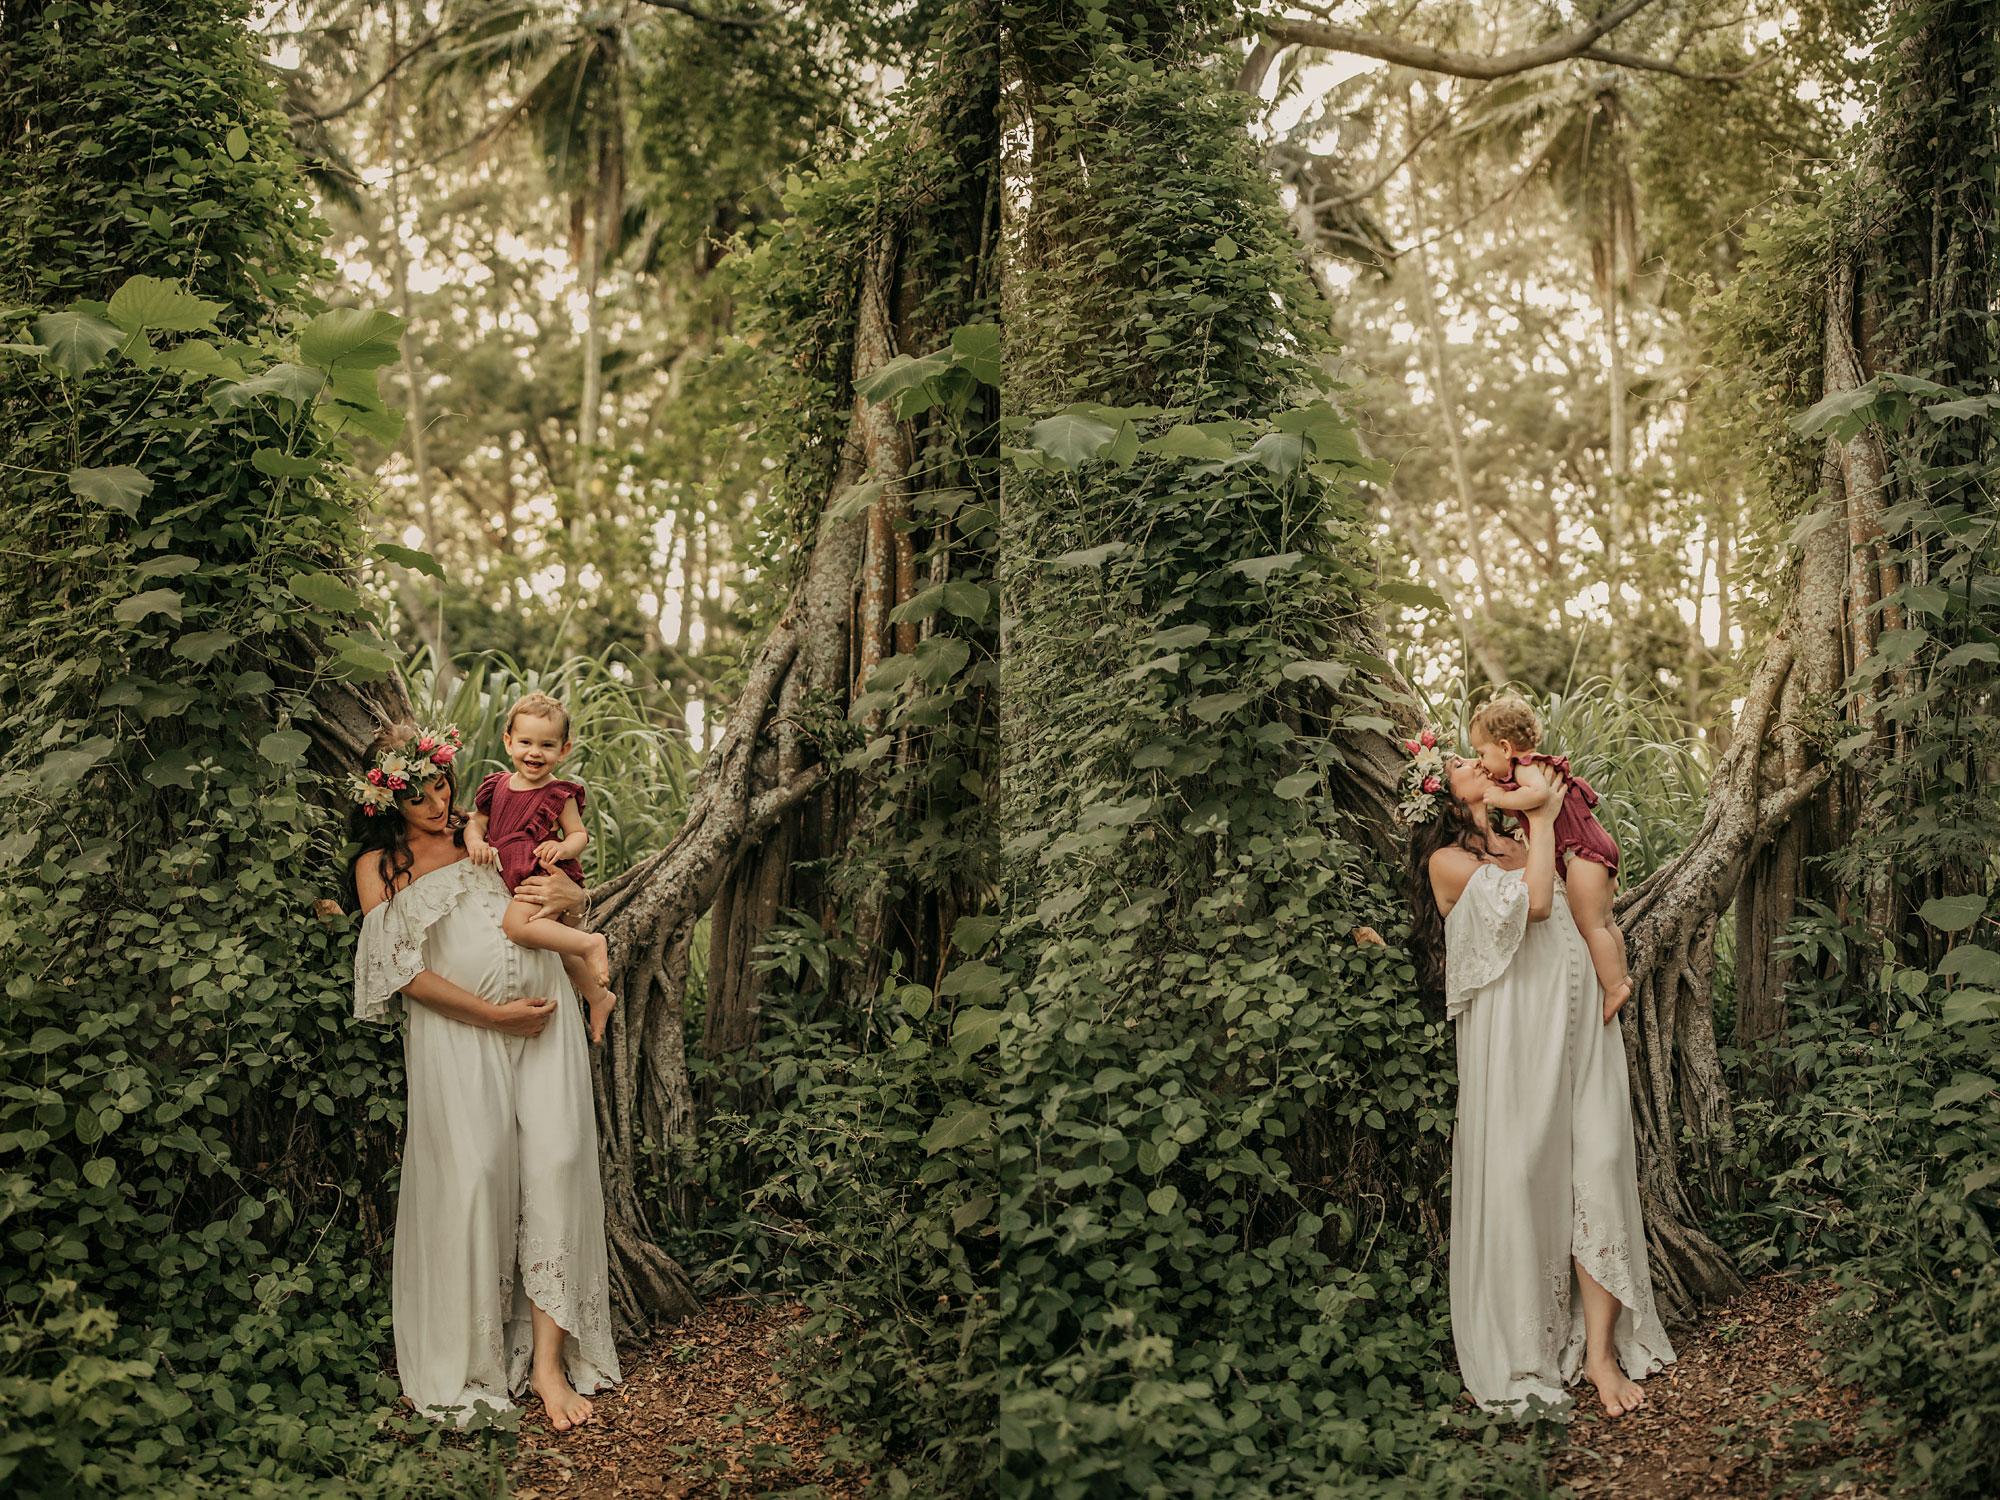 Hawaii-Oahu-Maternity-Photography-The-Sophia-Co-006.jpg